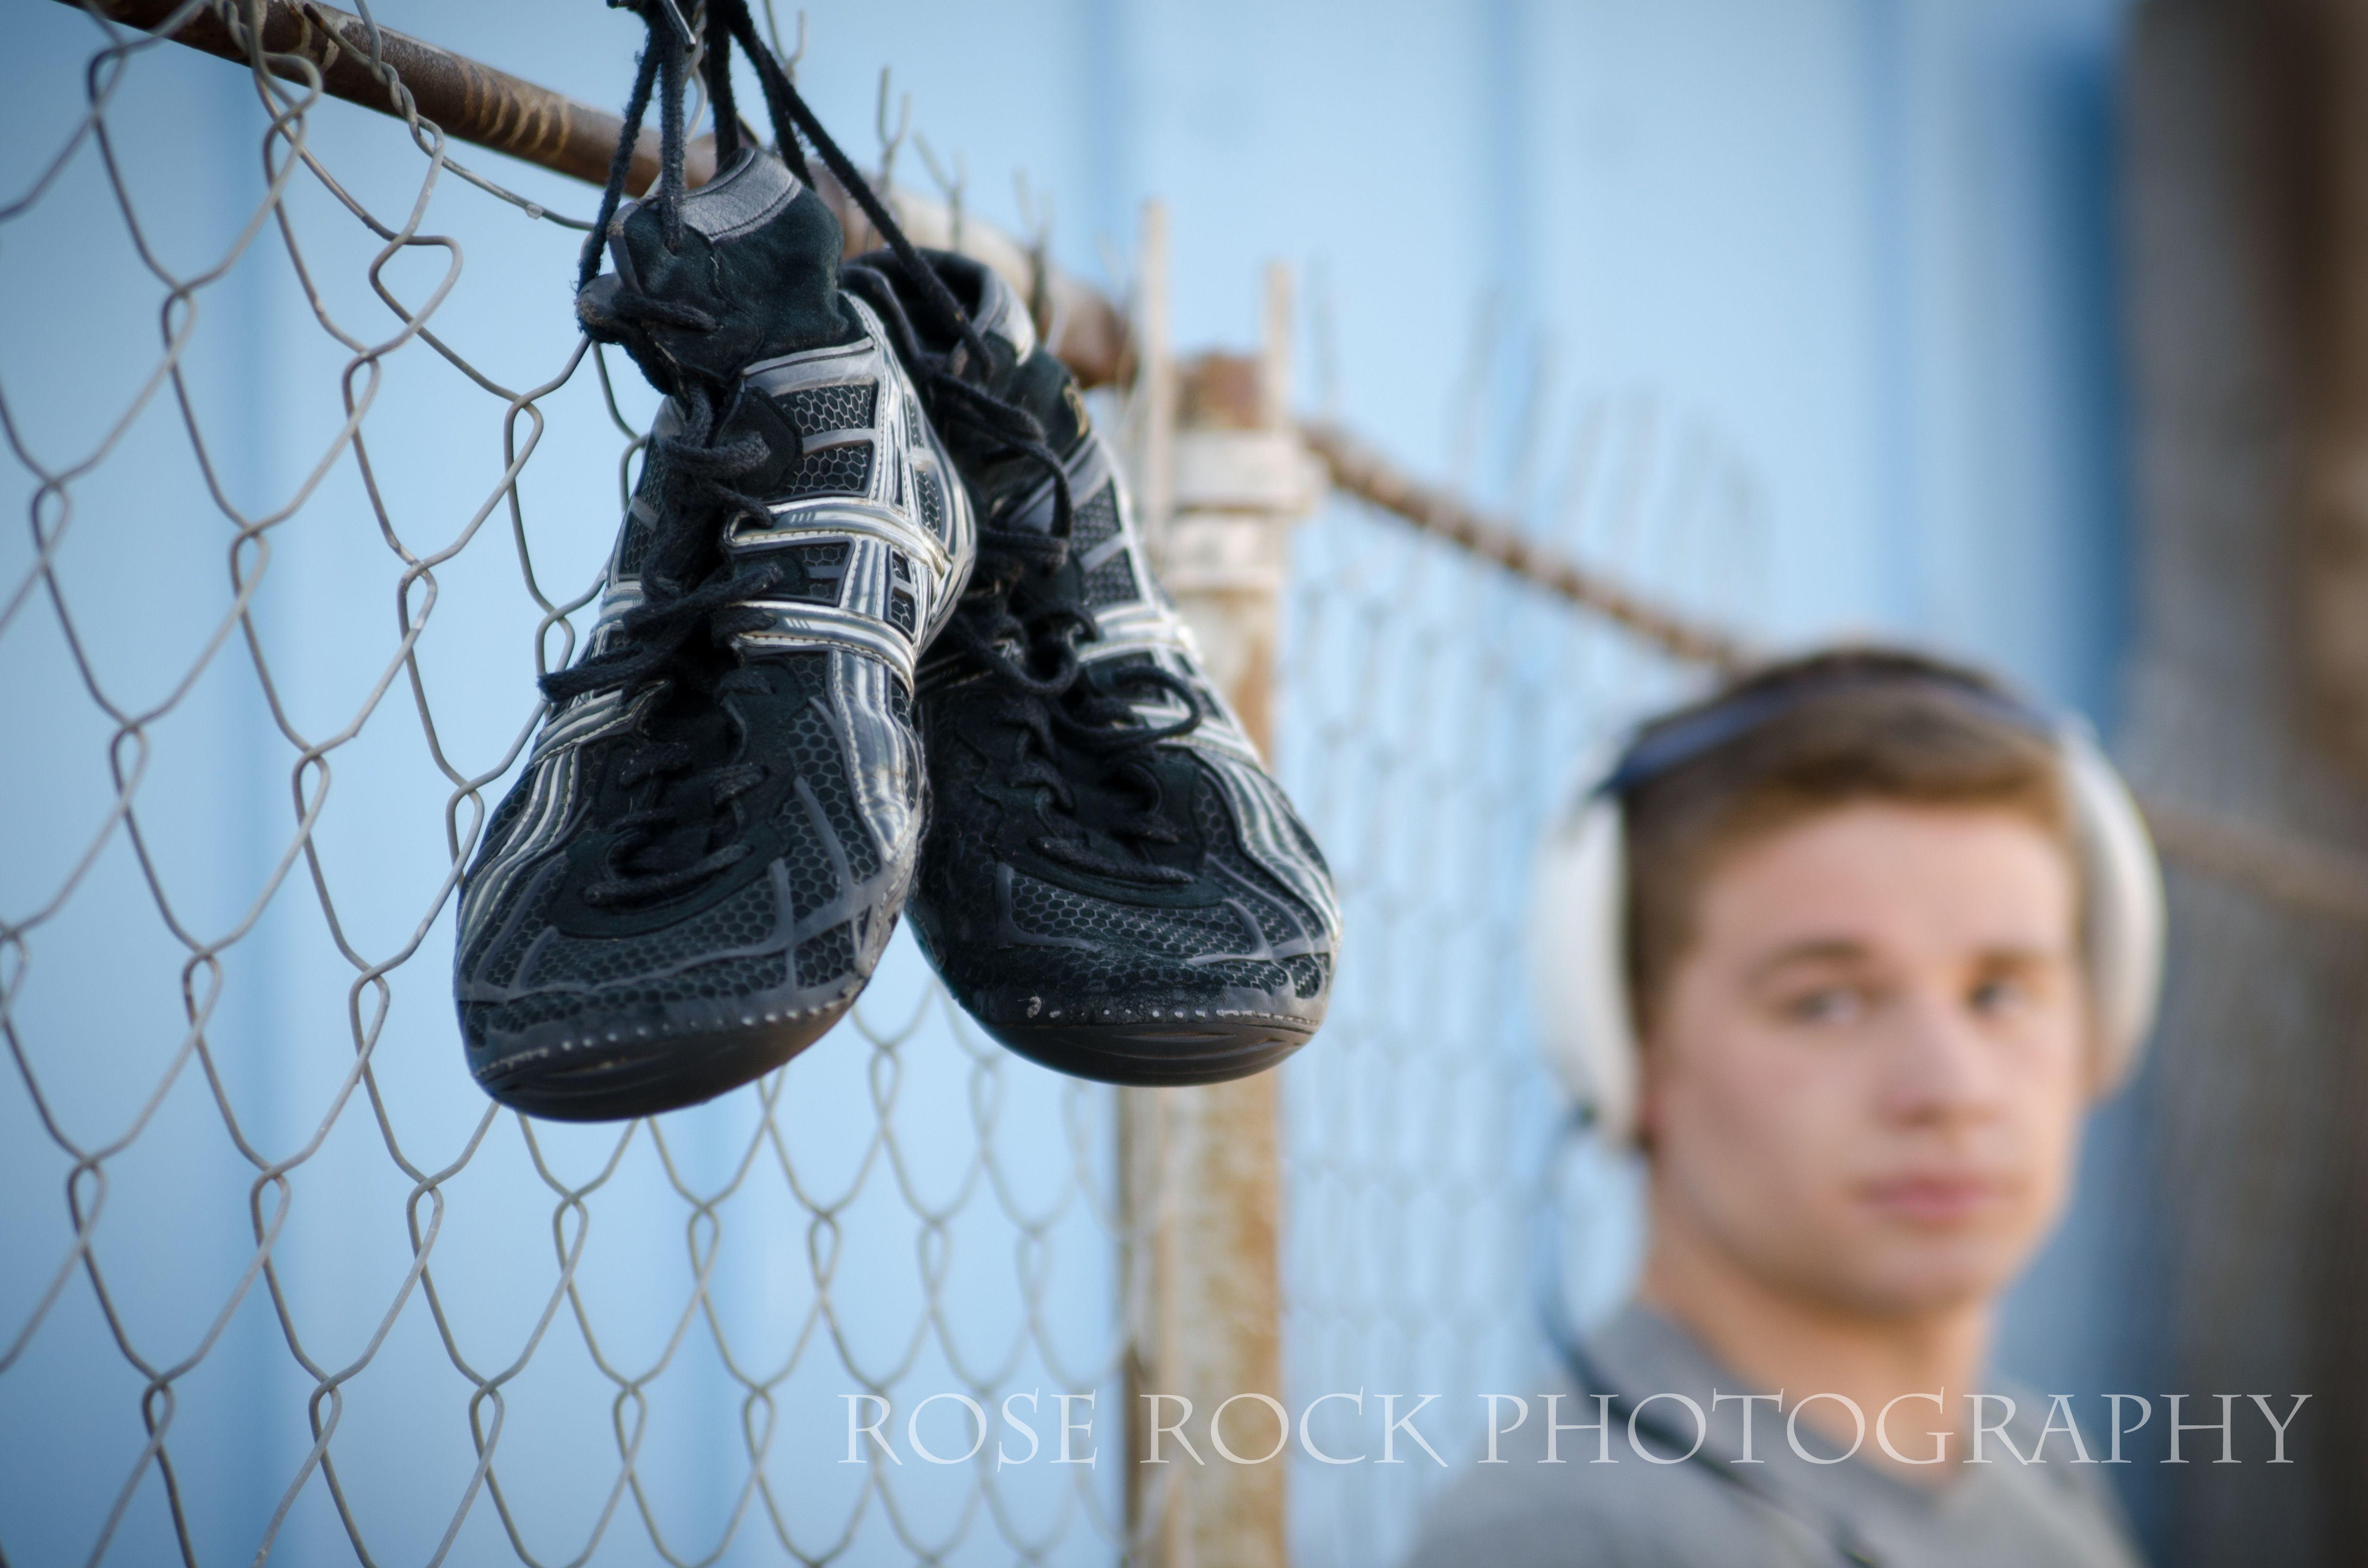 Rose Rock Photography Senior Boy Photography Senior Pictures Boys Wrestling Senior Pictures